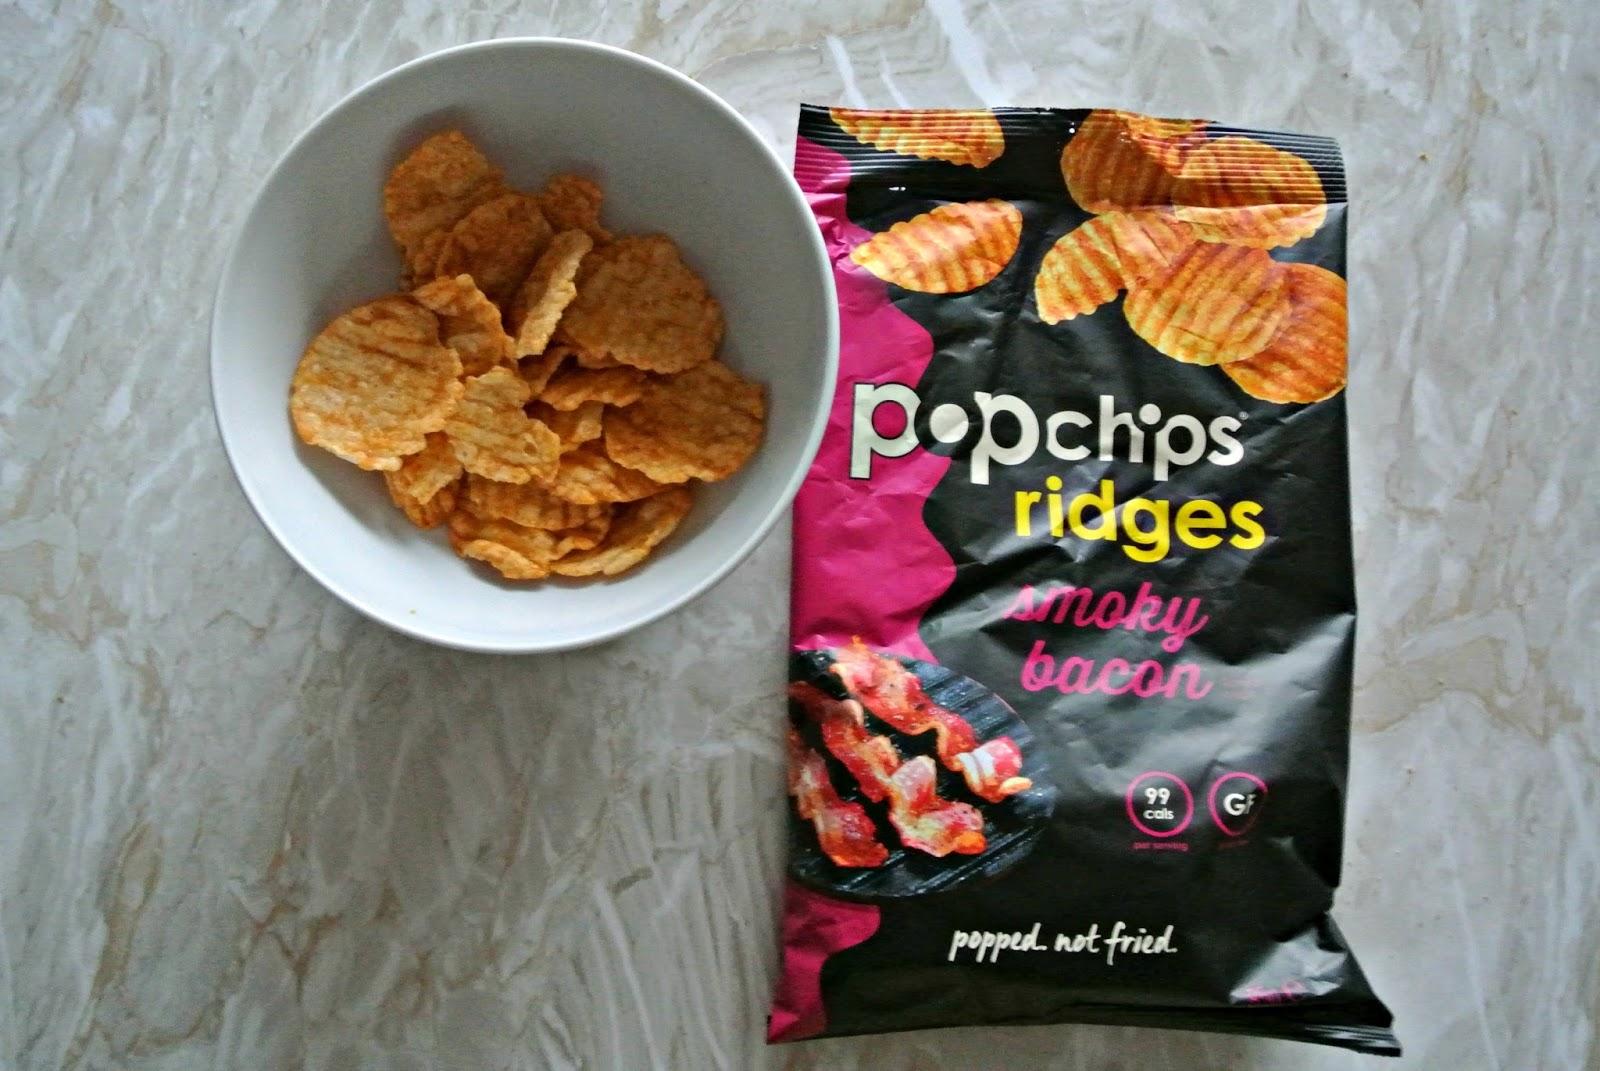 Popchips Ridges in Smoky Bacon Degustabox